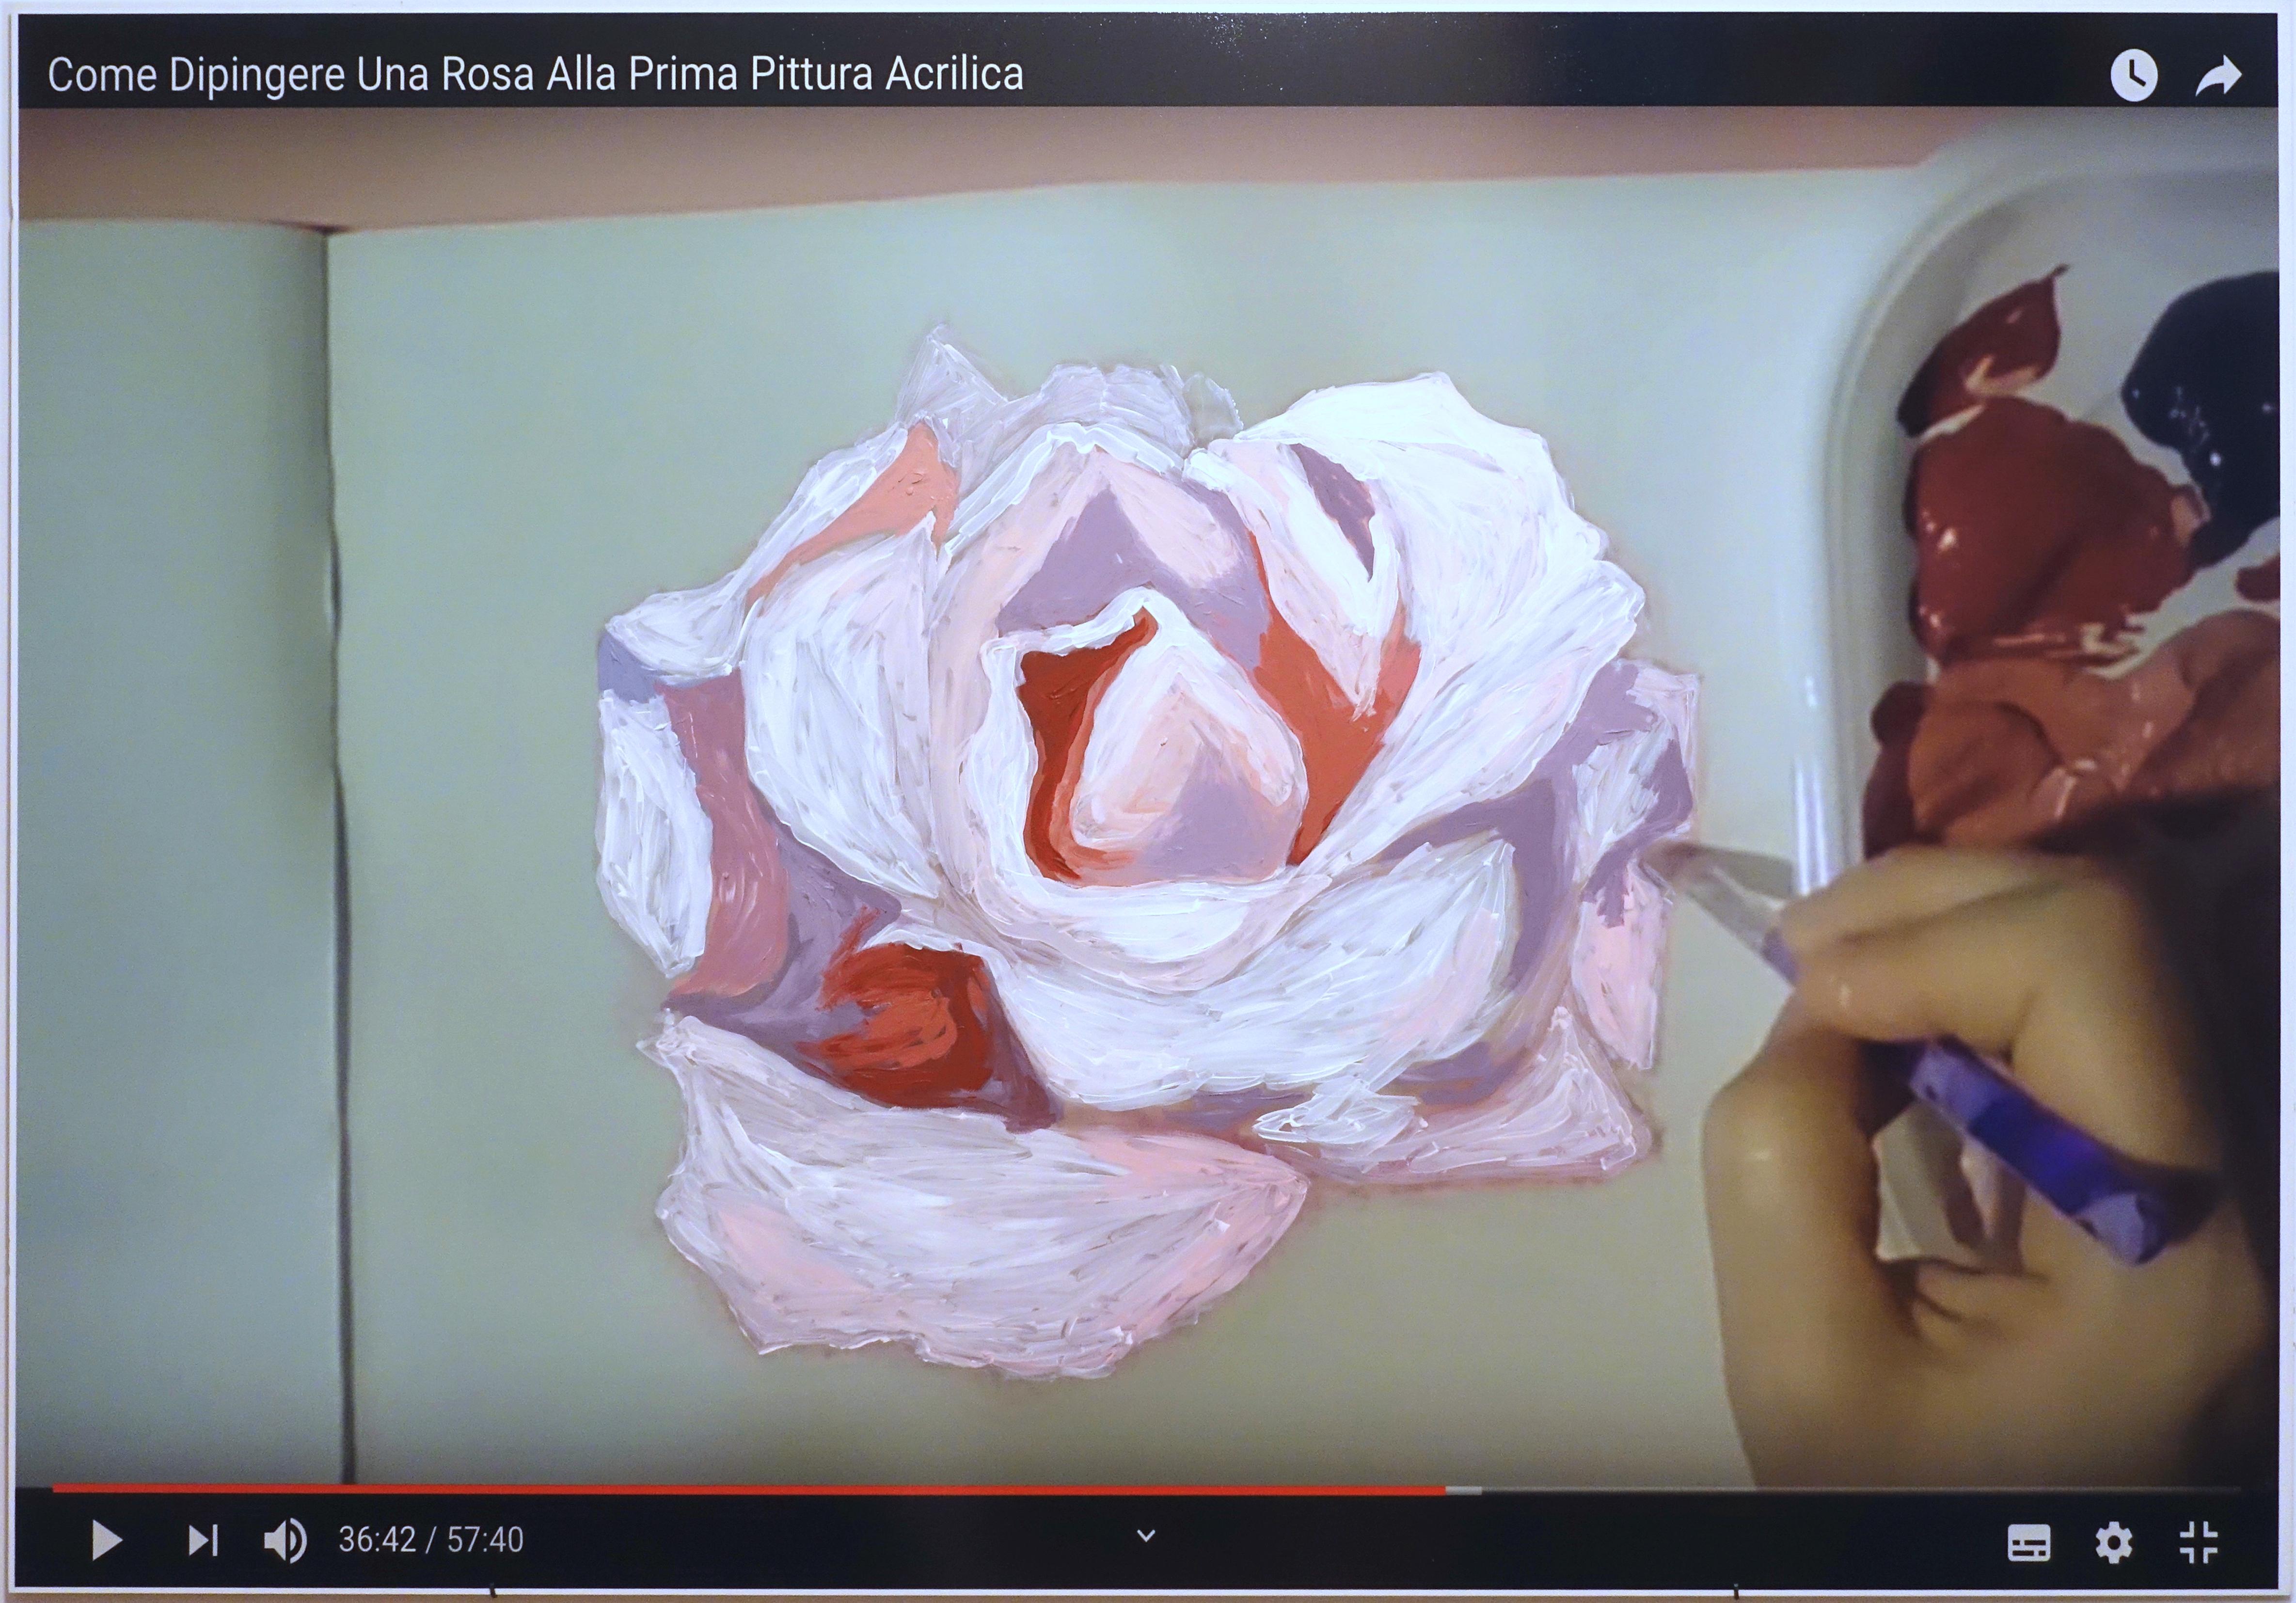 Giuseppina Giordano, www.youtube.com/watch?v=dXkEED6hIkY (How to paint a rose, tutorial 2), 2019acrylic paint on printed pvc / 100x140x1cm